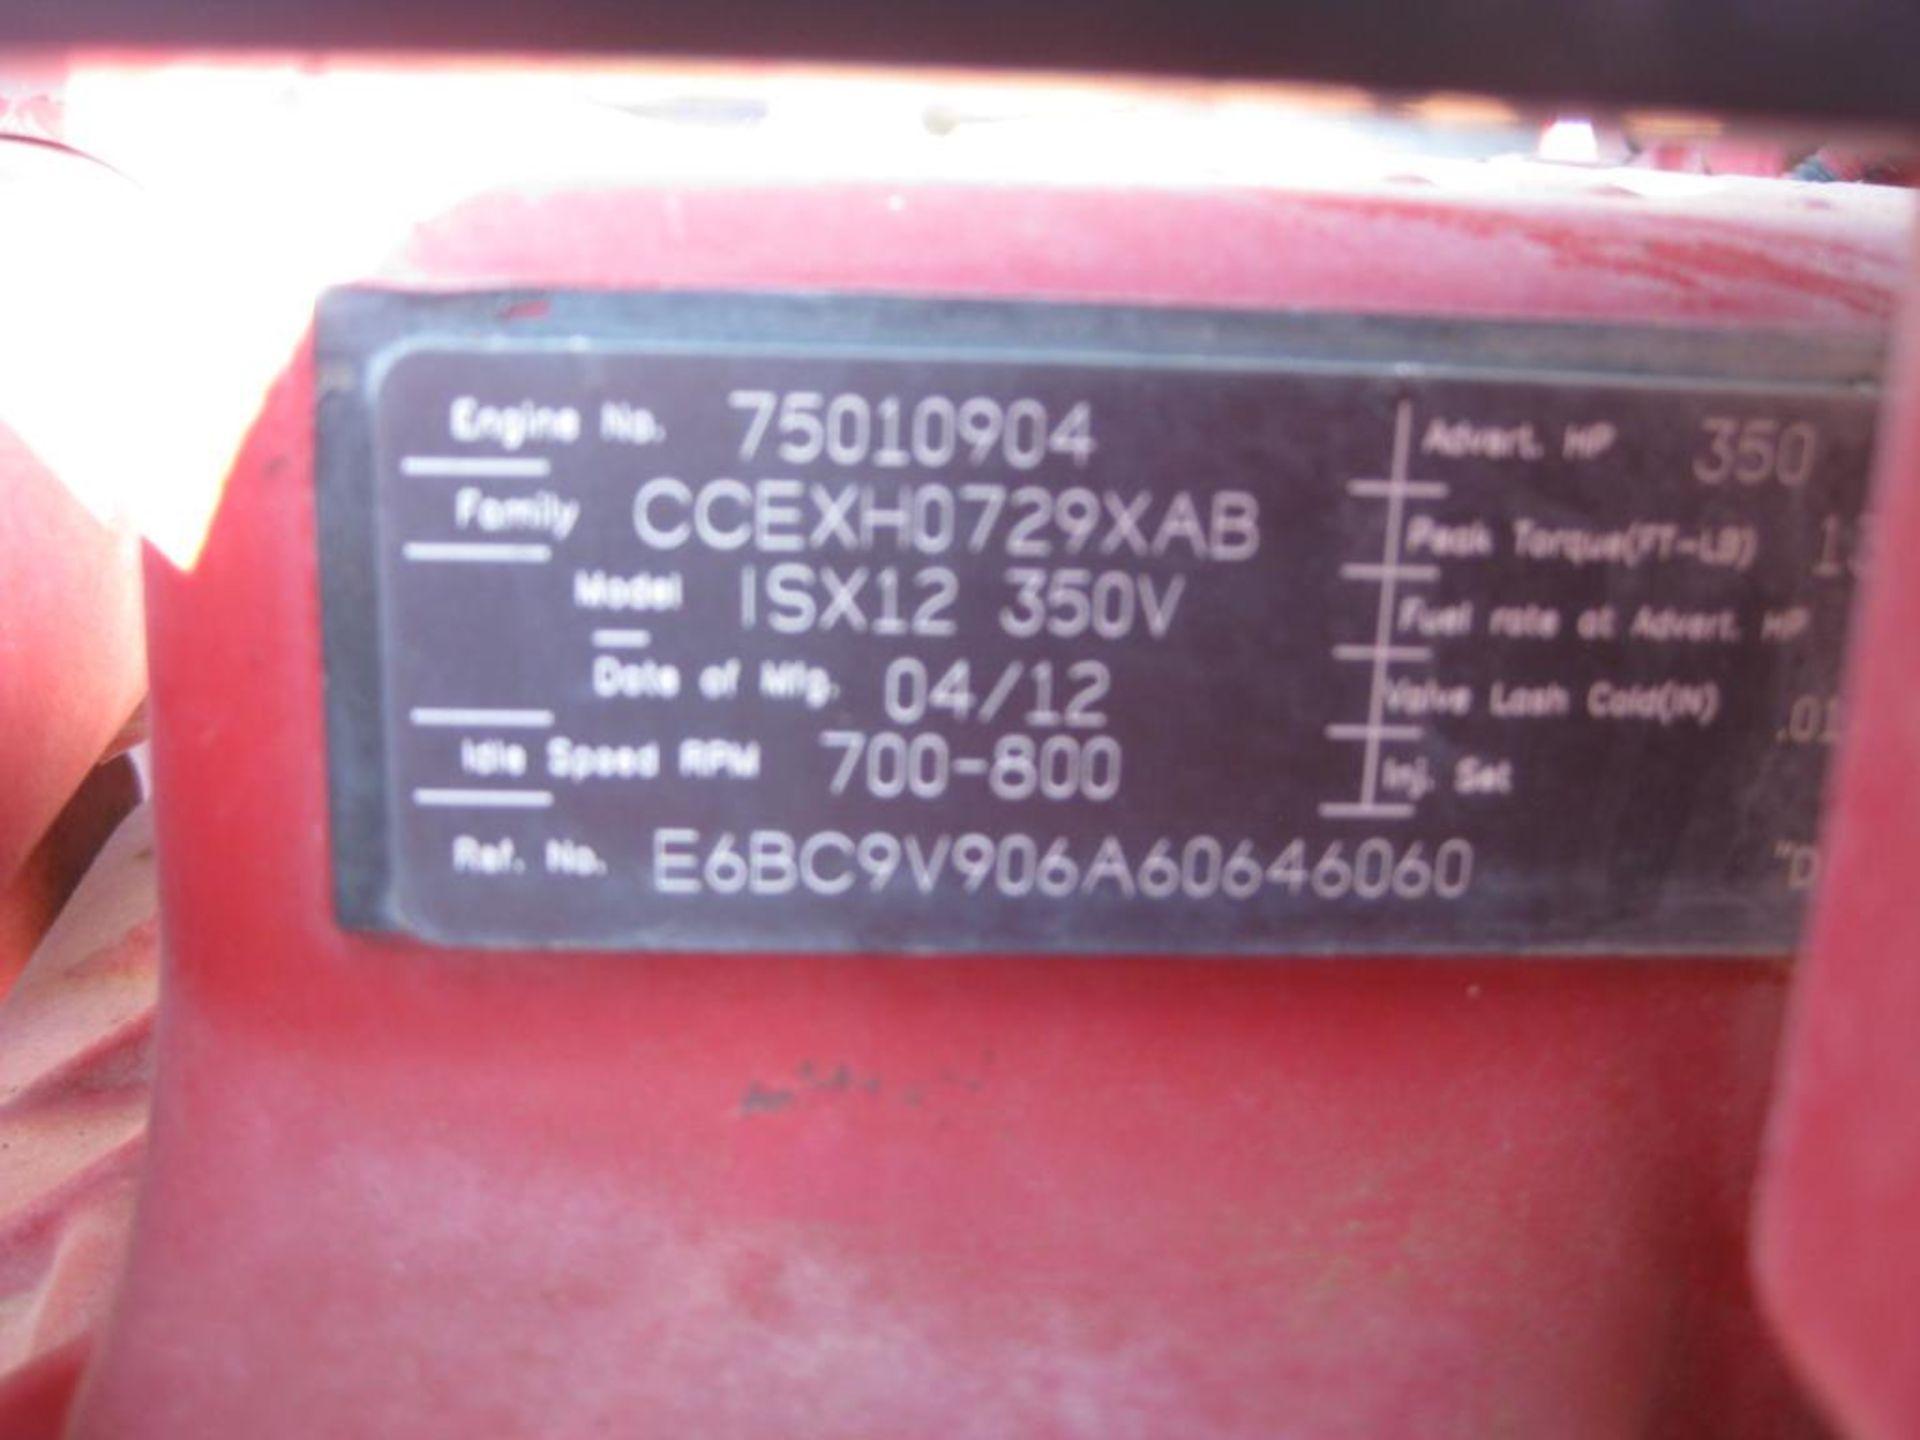 Kenworth Winch Truck - Image 25 of 25